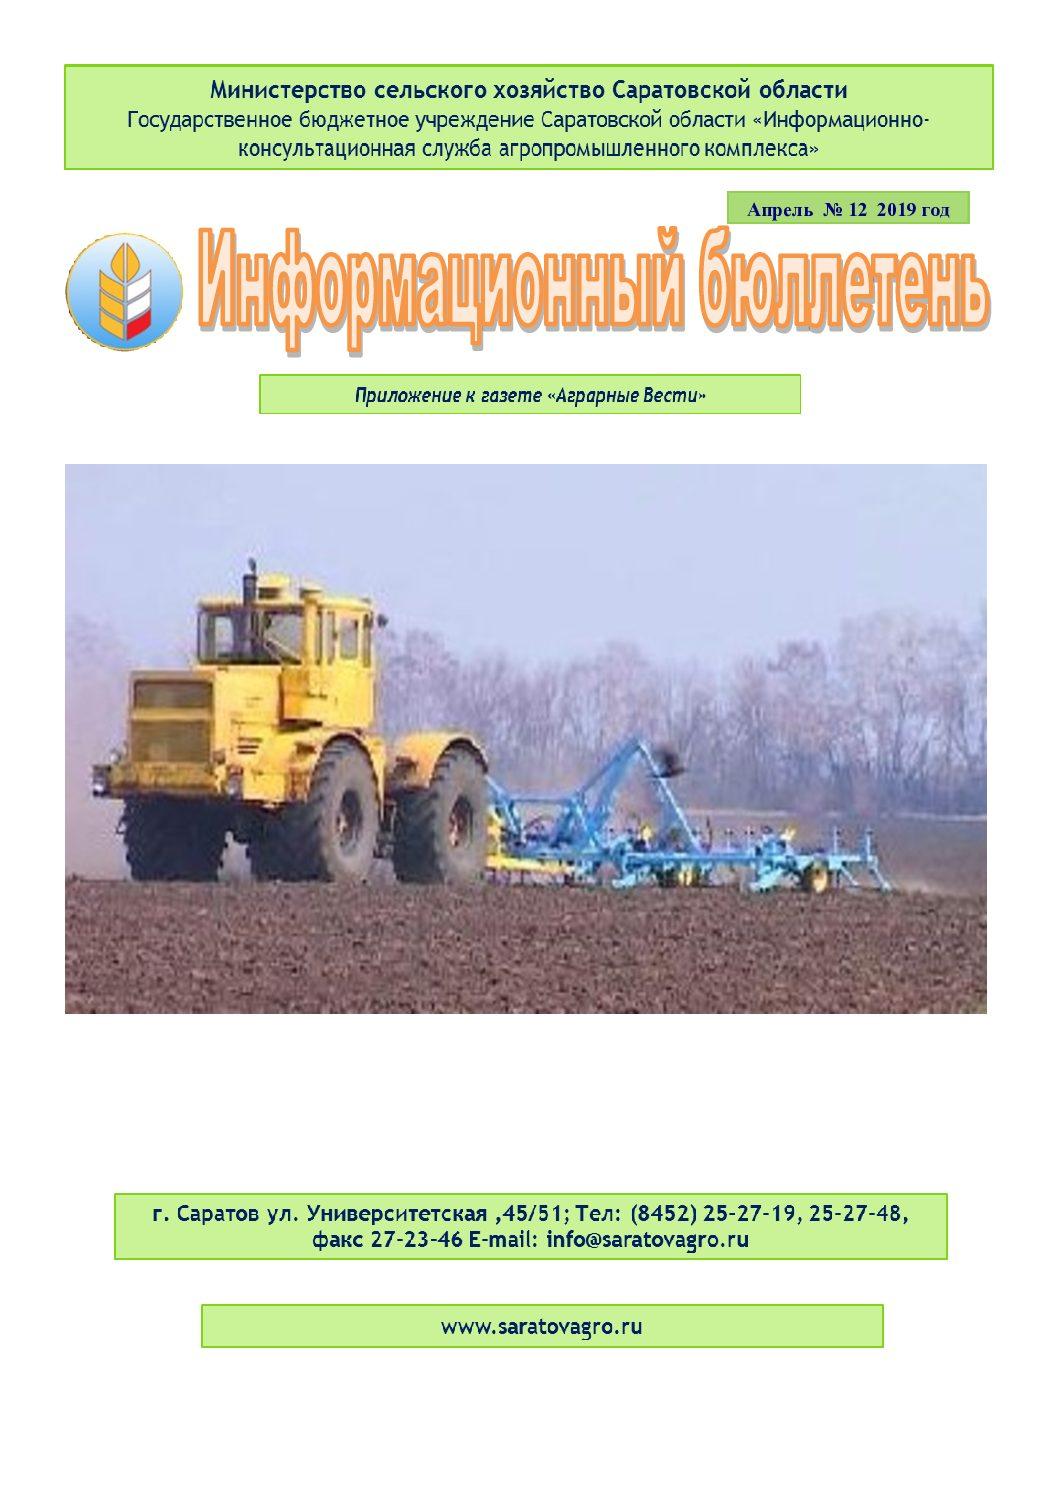 https://saratovagro.ru/wp-content/uploads/2020/08/12.2019-2-pdf.jpg